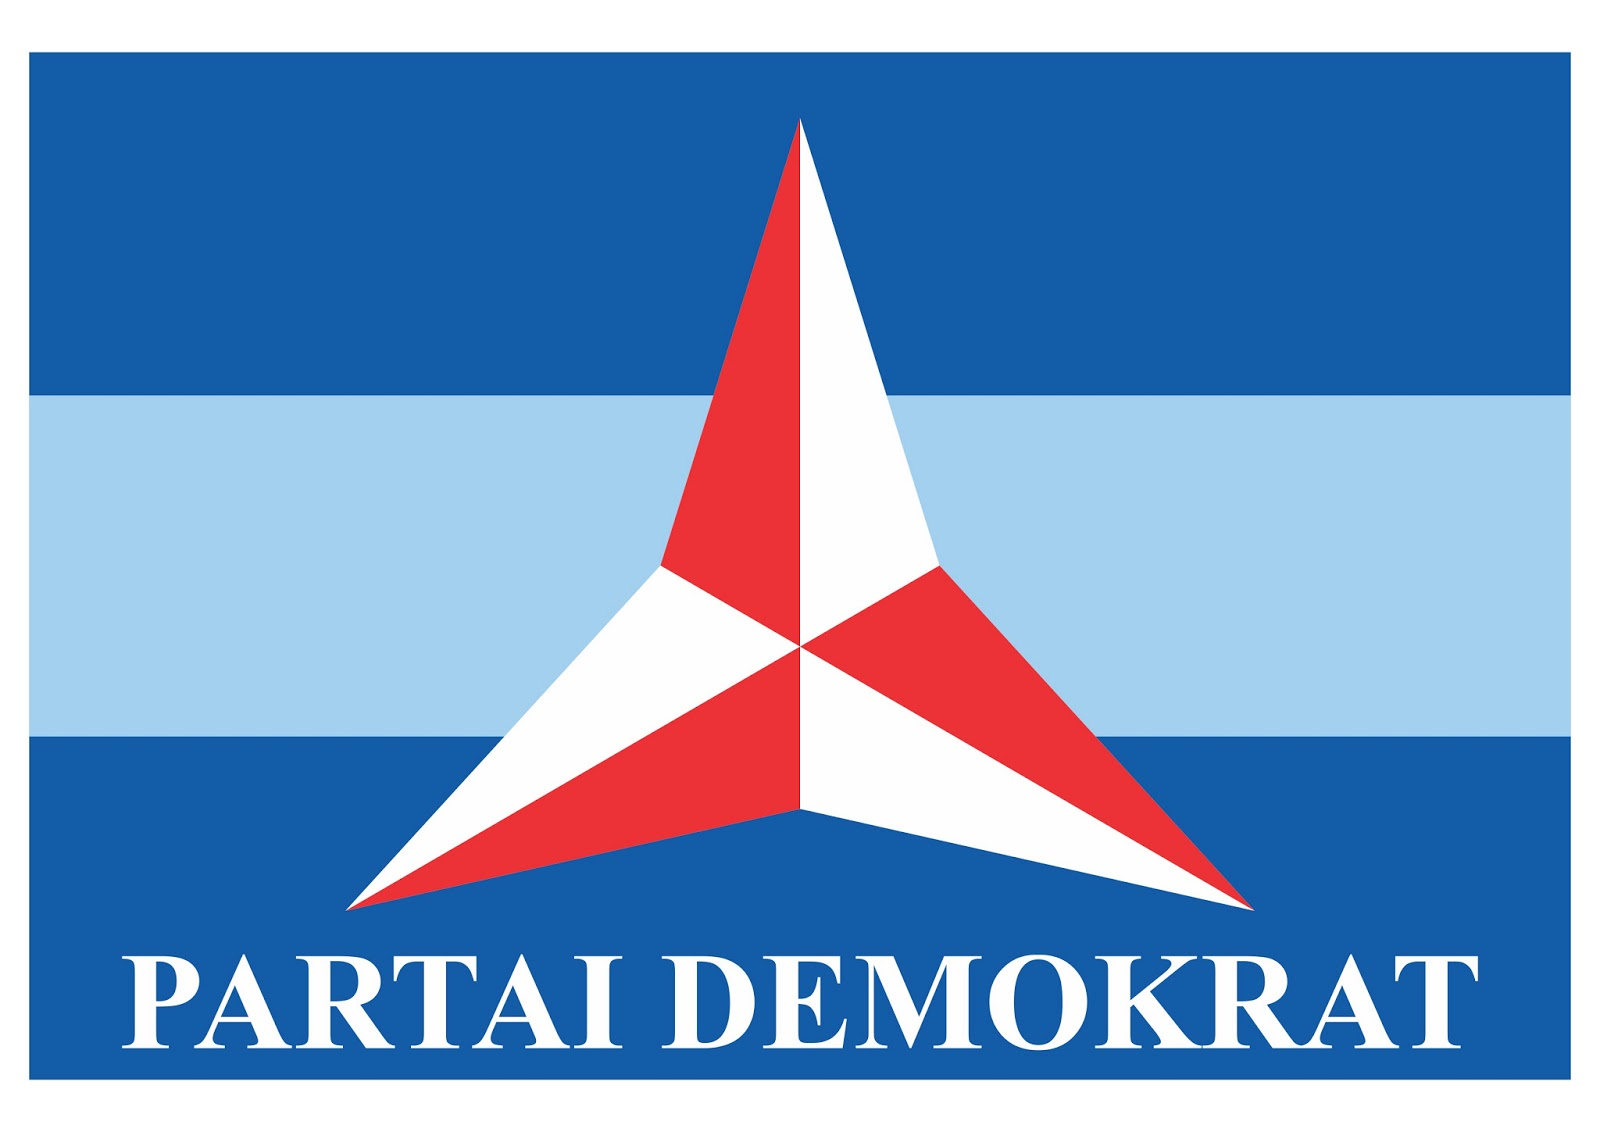 partai politik  IndonesianEnglish Dictionary  Glosbe